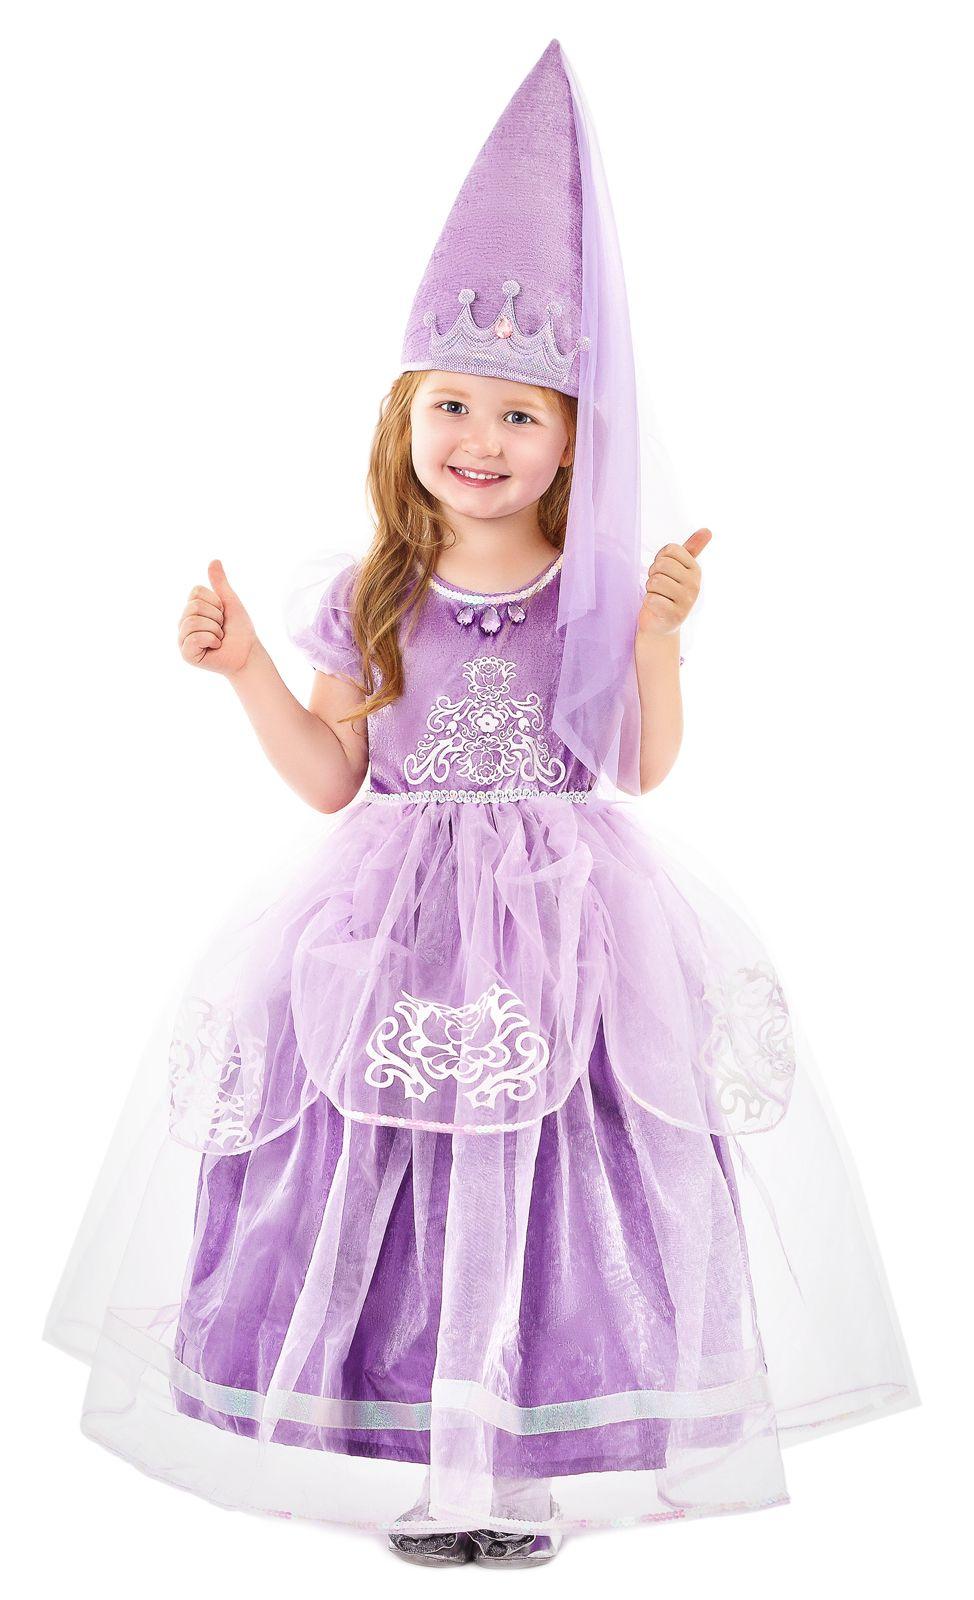 05ea46ac8 DELUXE Purple Amulet Princess Dress | Kids - Fairytale | Toddler ...